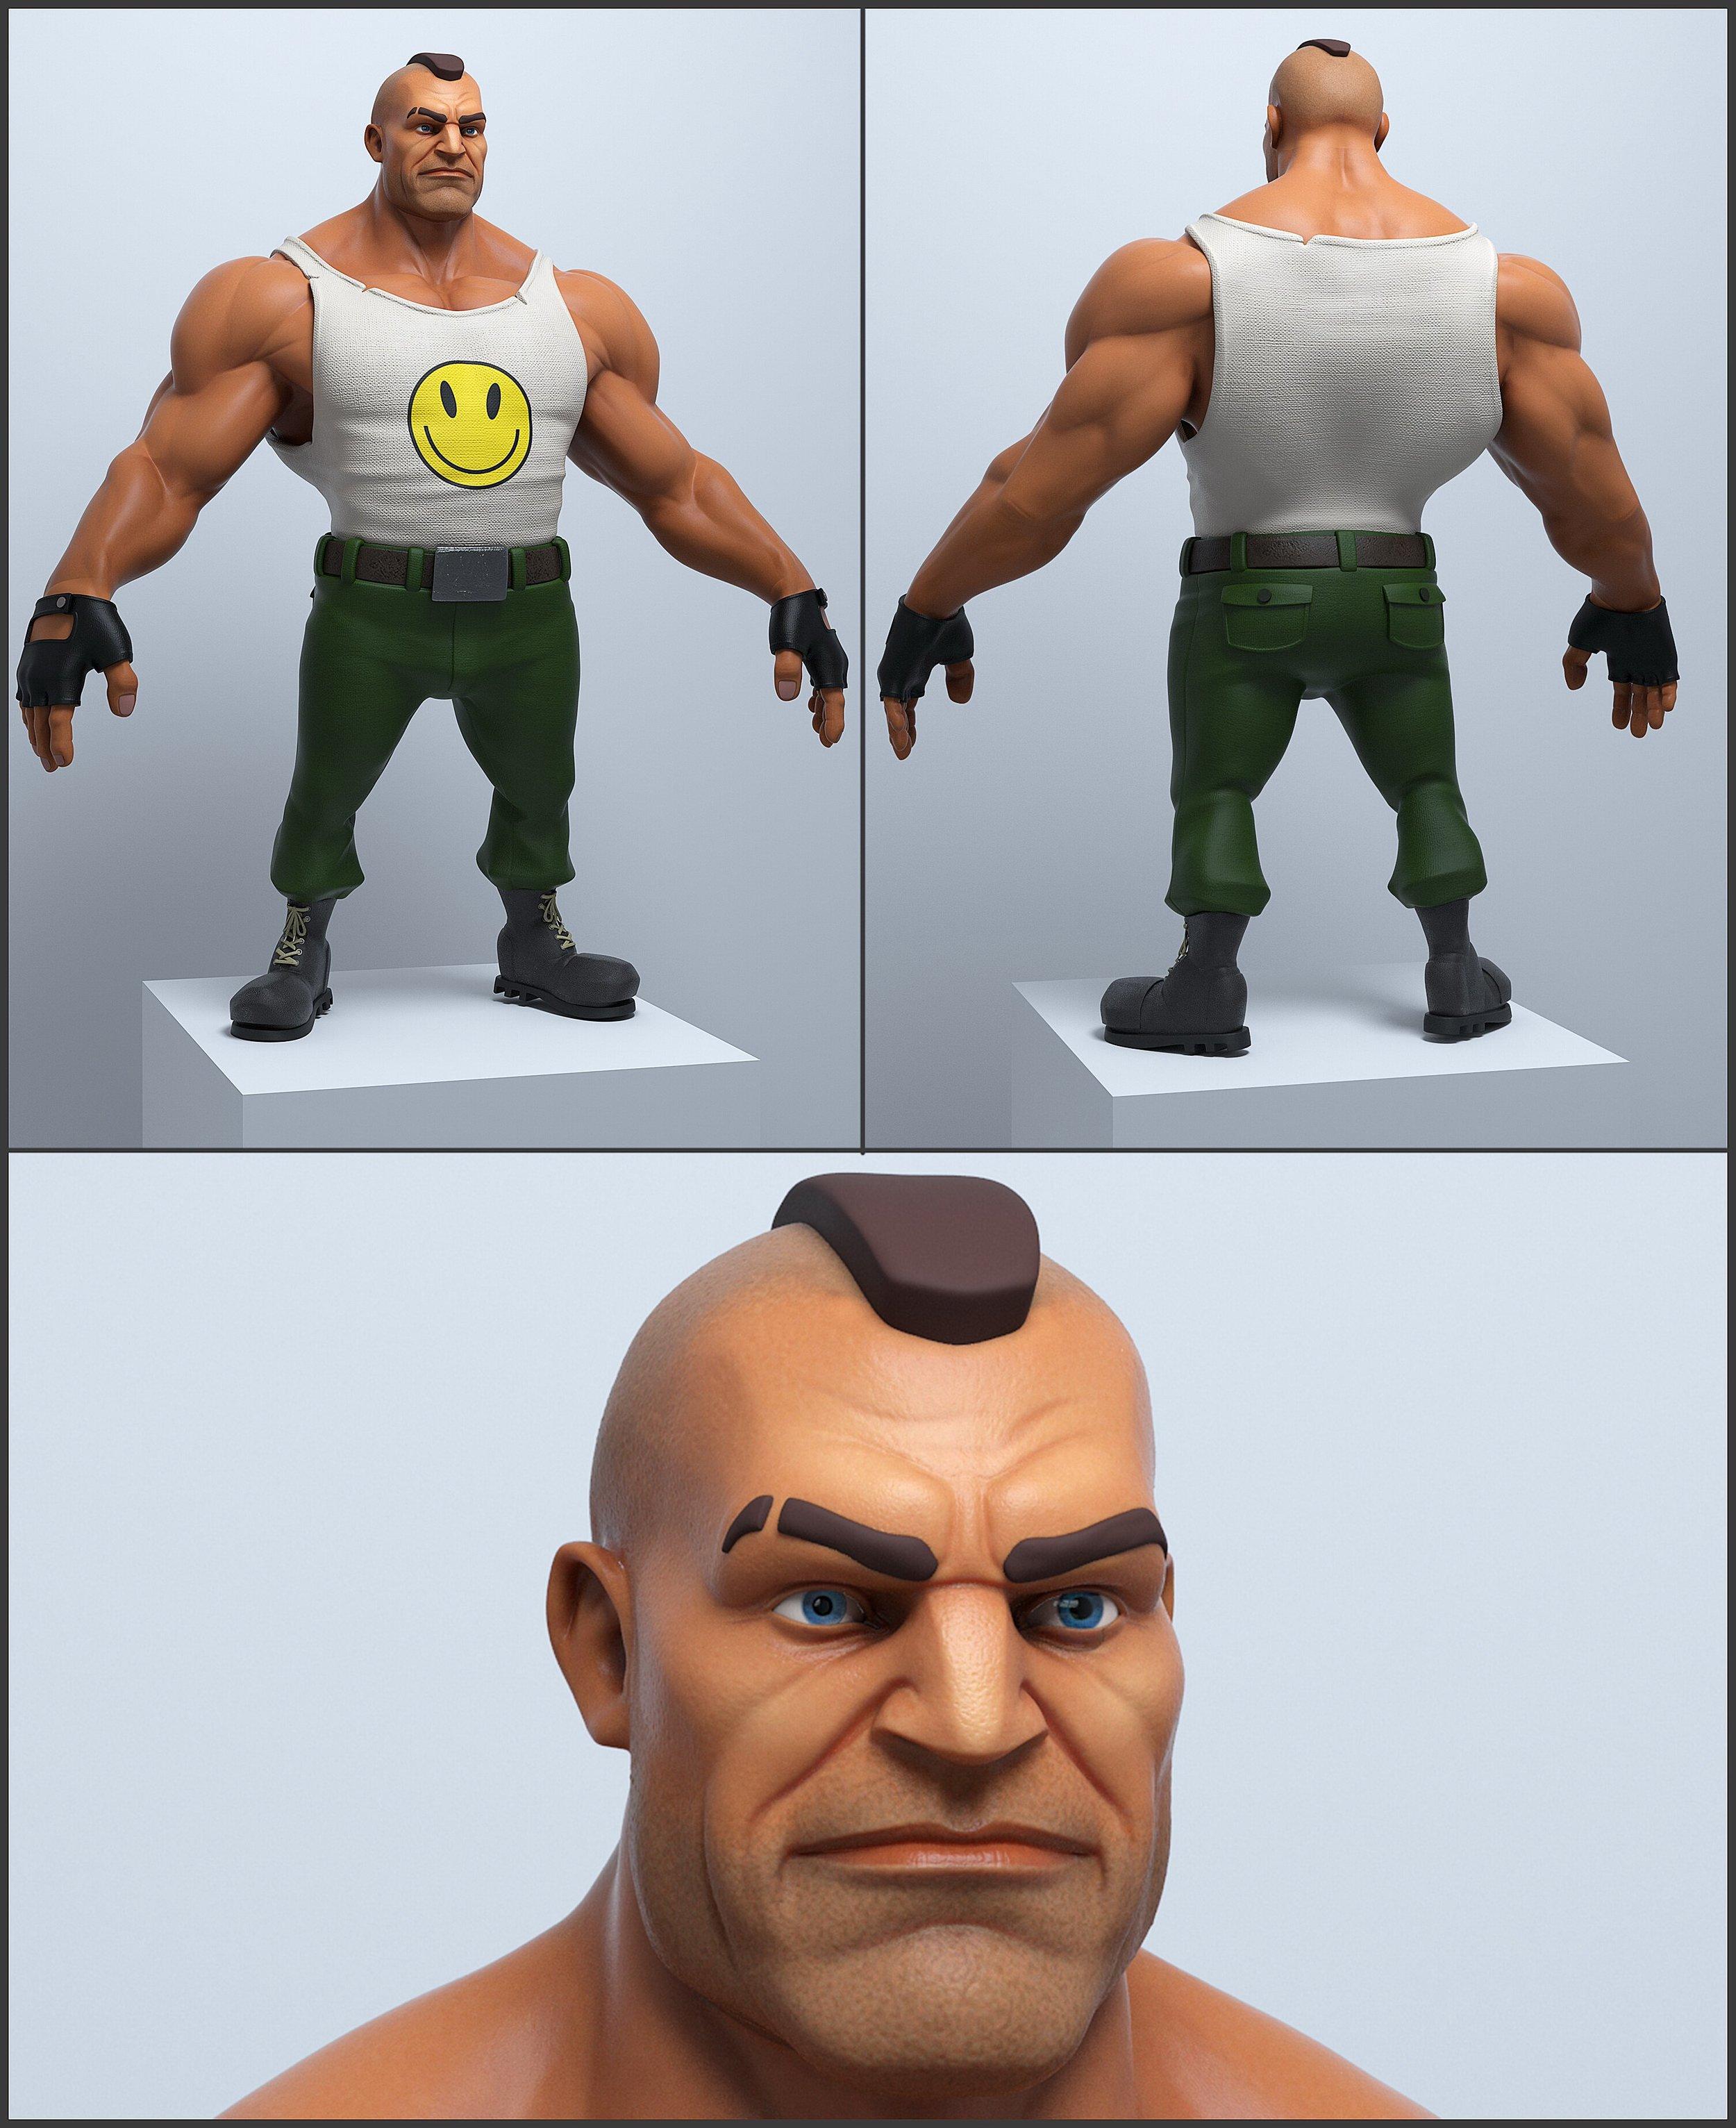 GG_character.jpg